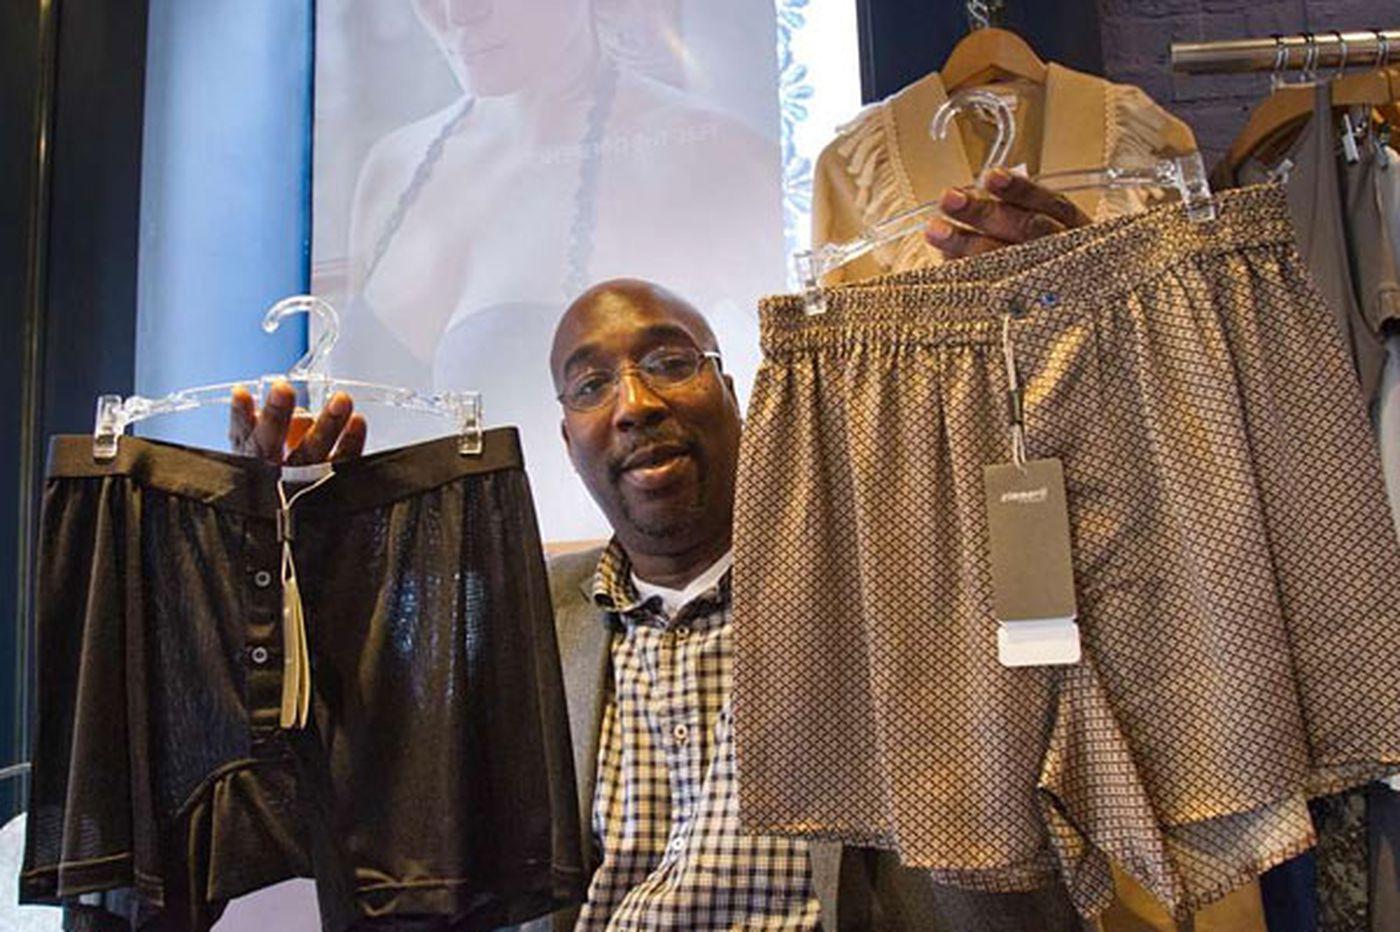 Mirror, Mirror: This holiday season retailers betting on the men